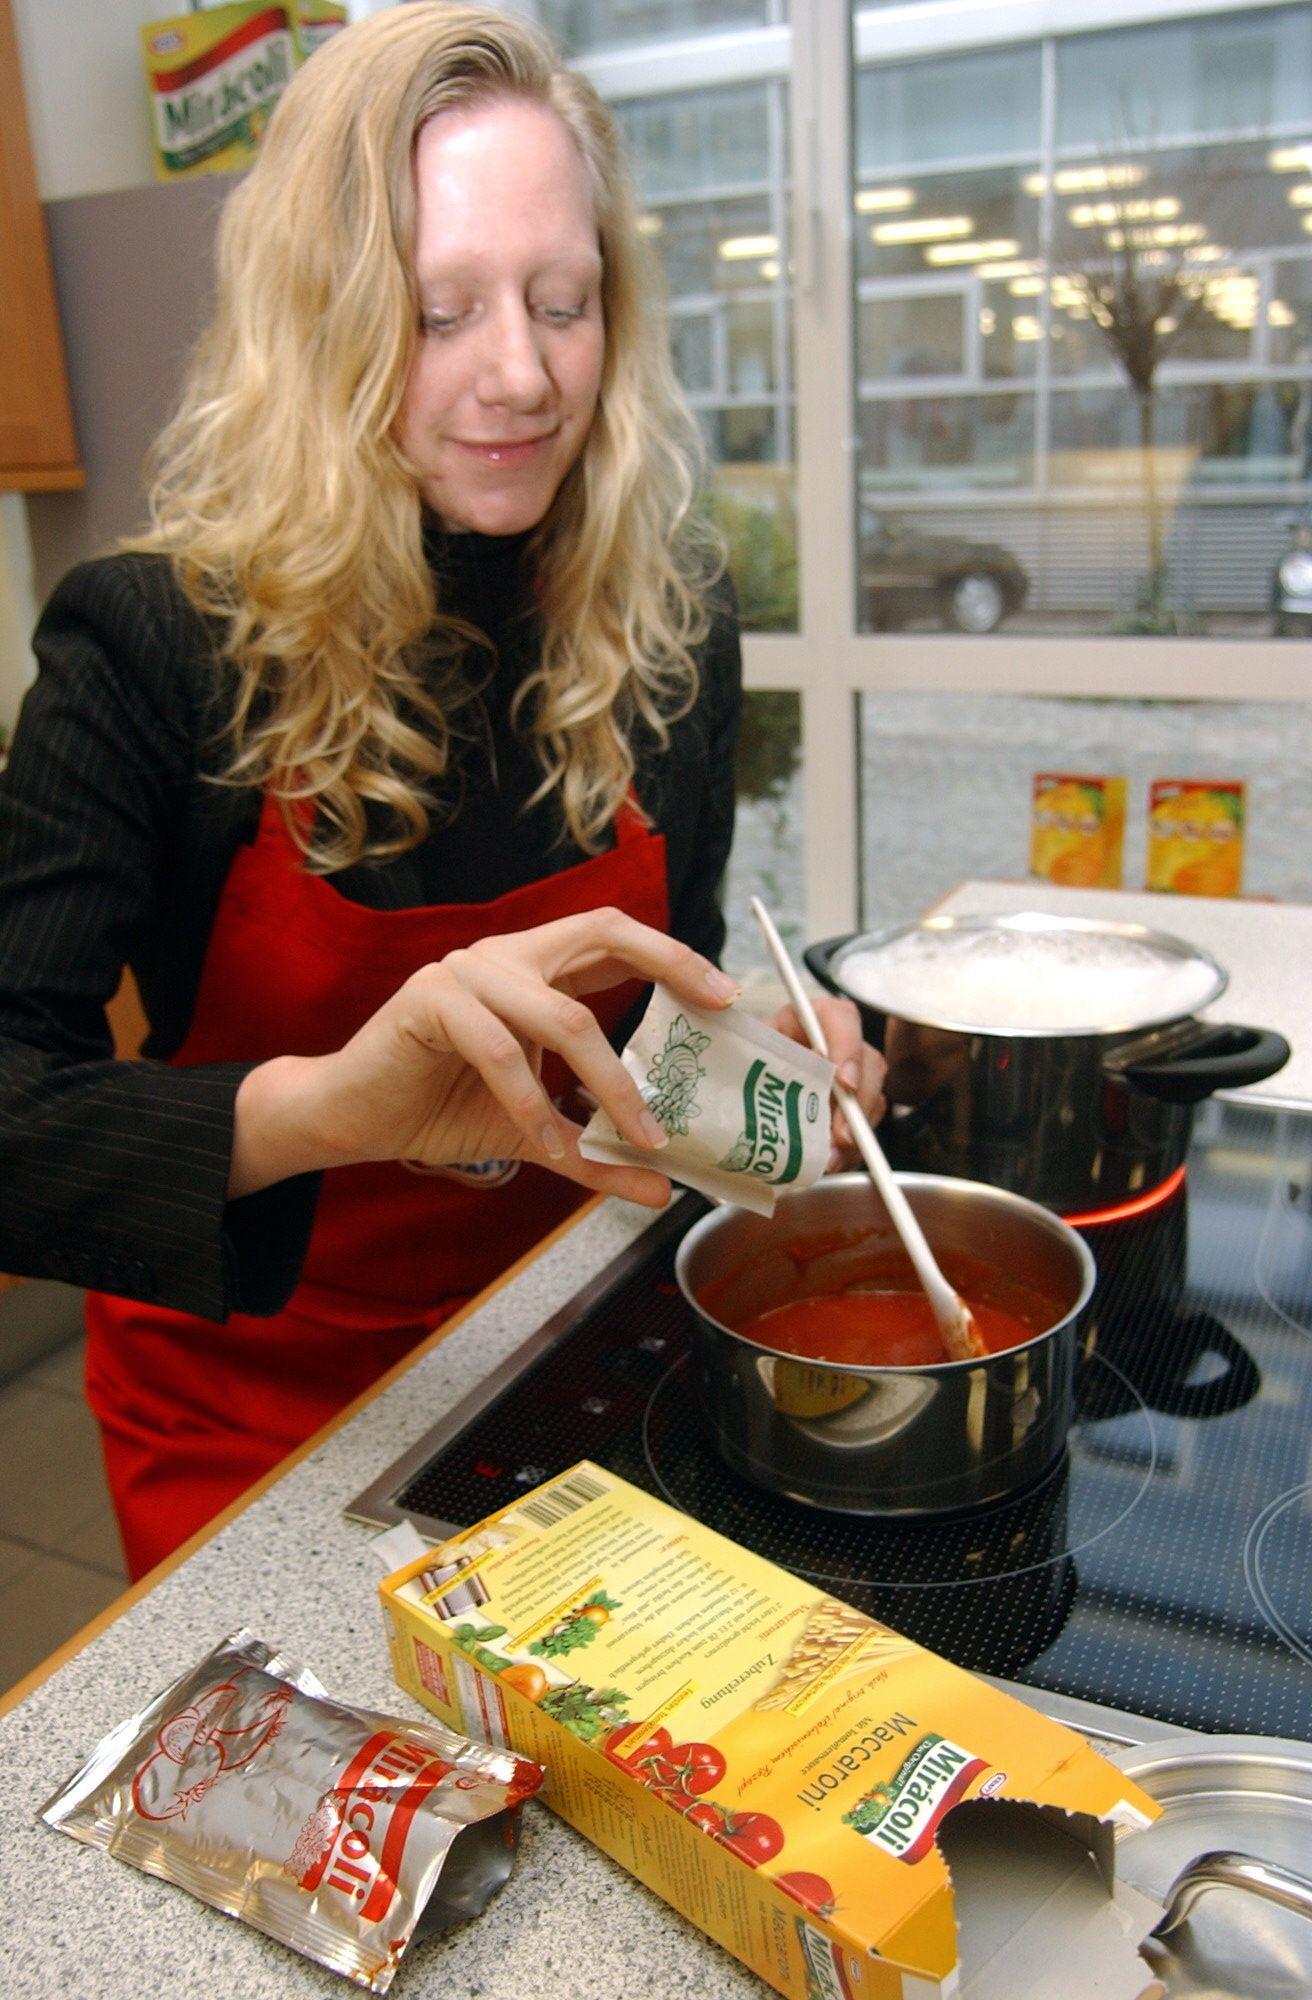 NICHT VERWENDEN Miracoli / Kraft Foods / Nudeln / Spaghetti mit Tomatensoße / Pasta